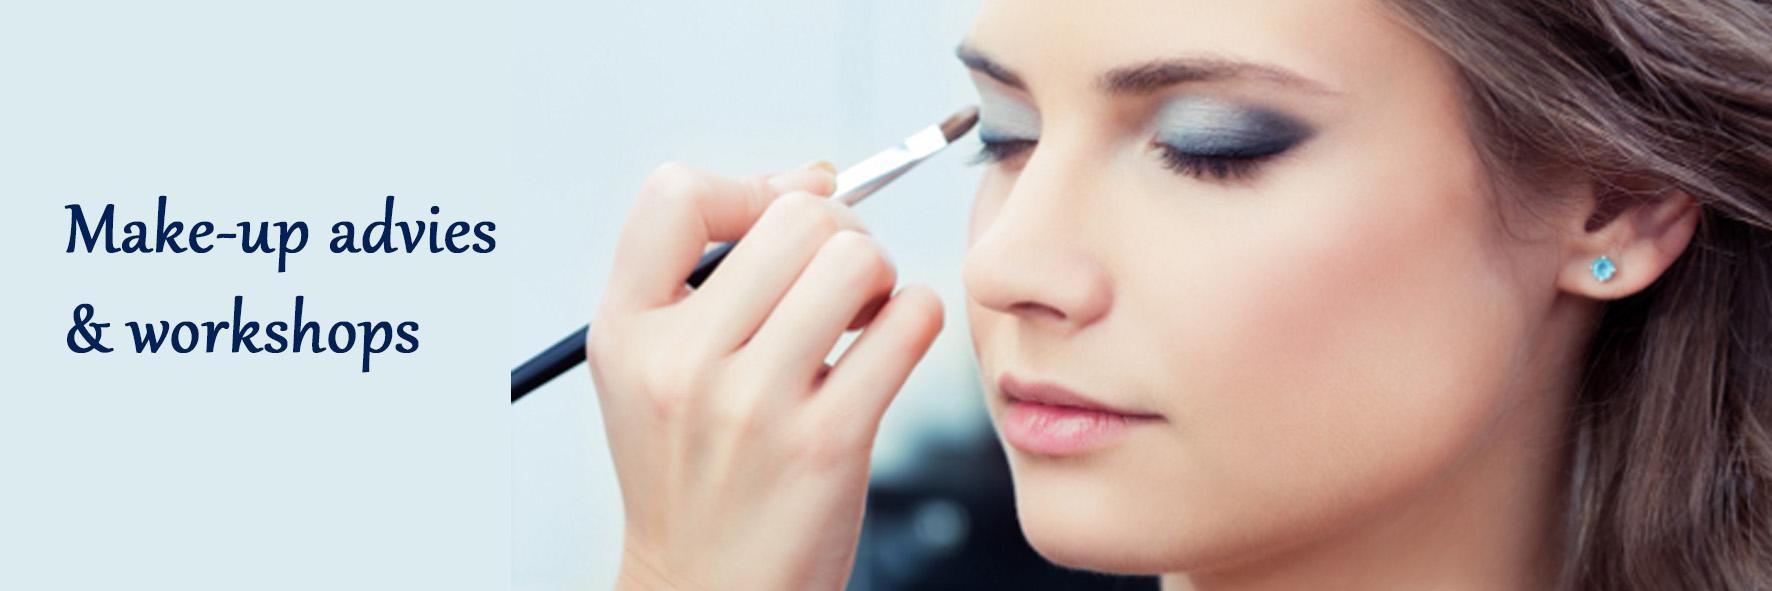 make up advies